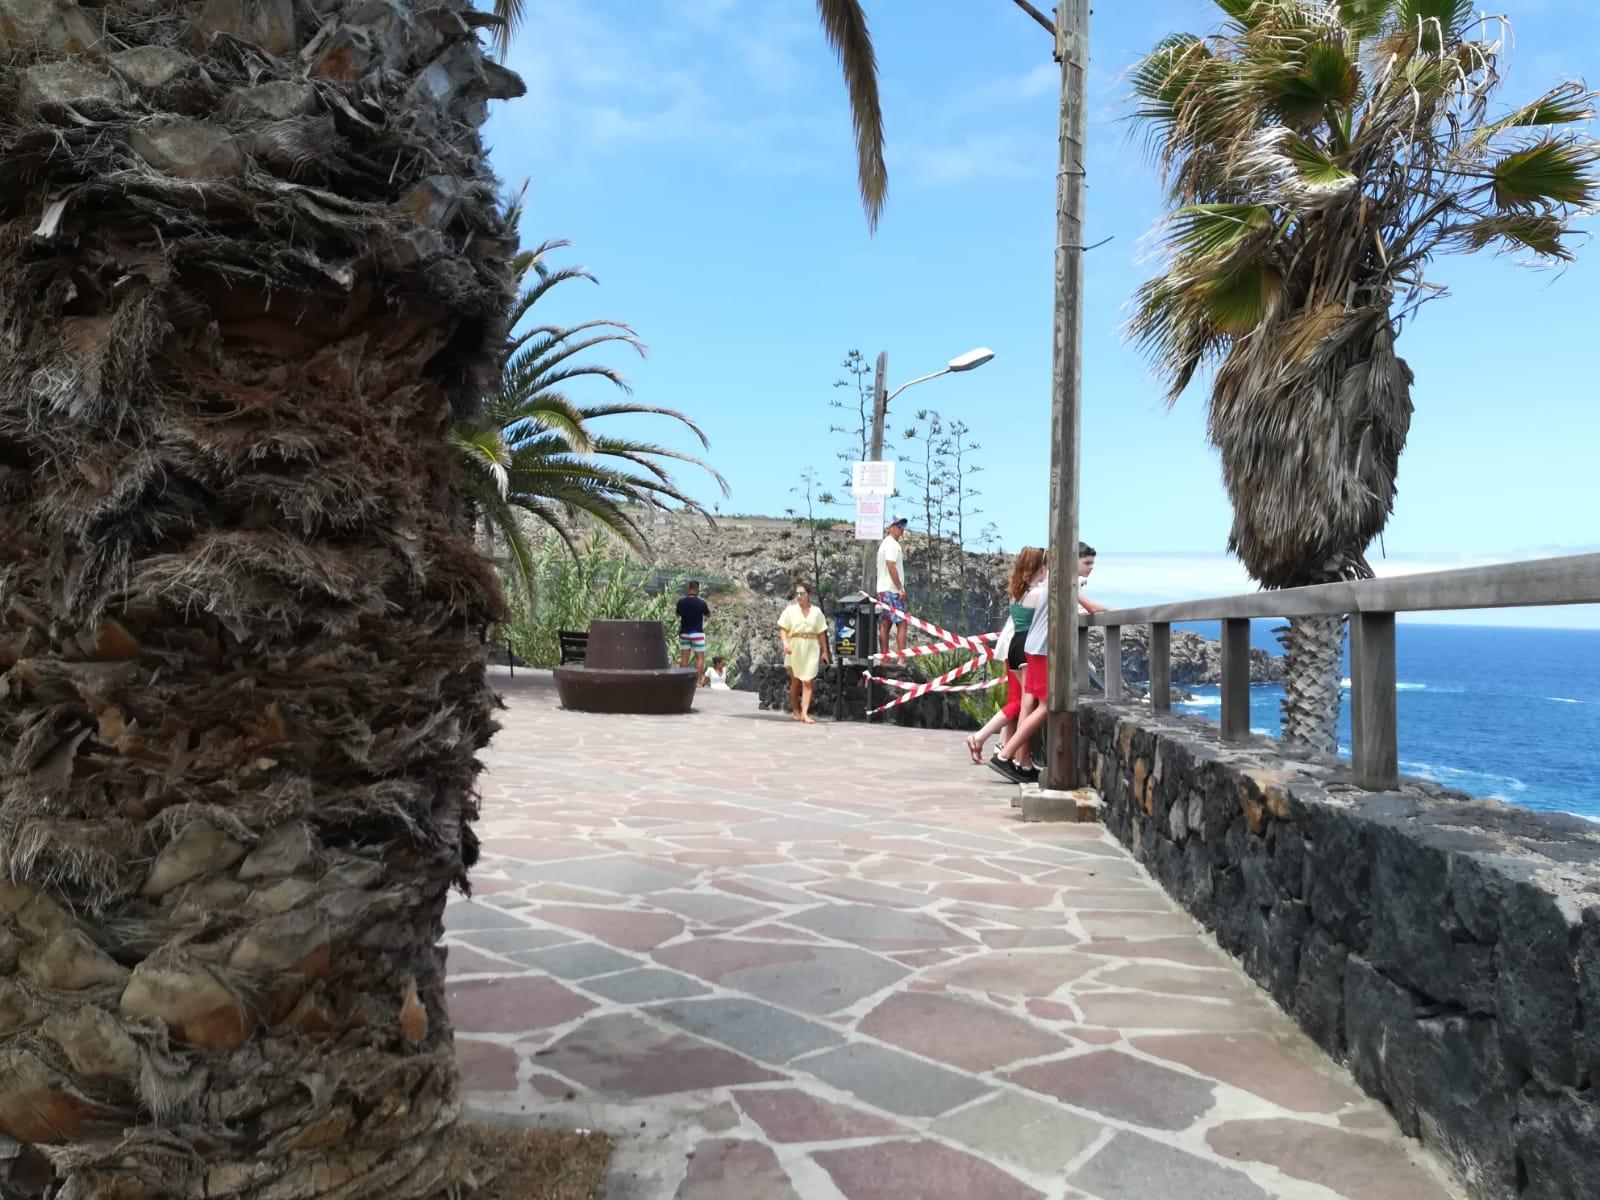 Fuerte oleaje en el Charco de La Laja, en San Juan de la Rambla.   DA